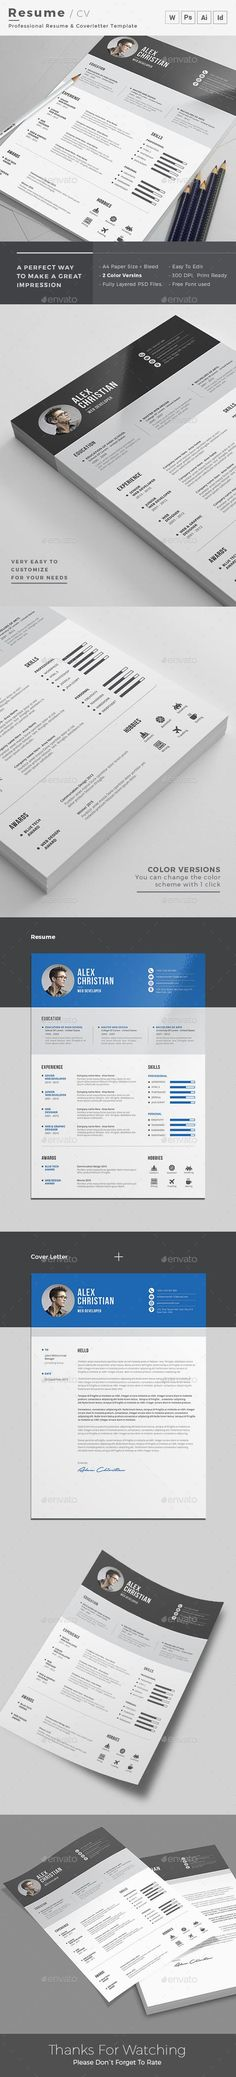 Made  Material Design Resume  Cv Template  Design Resume